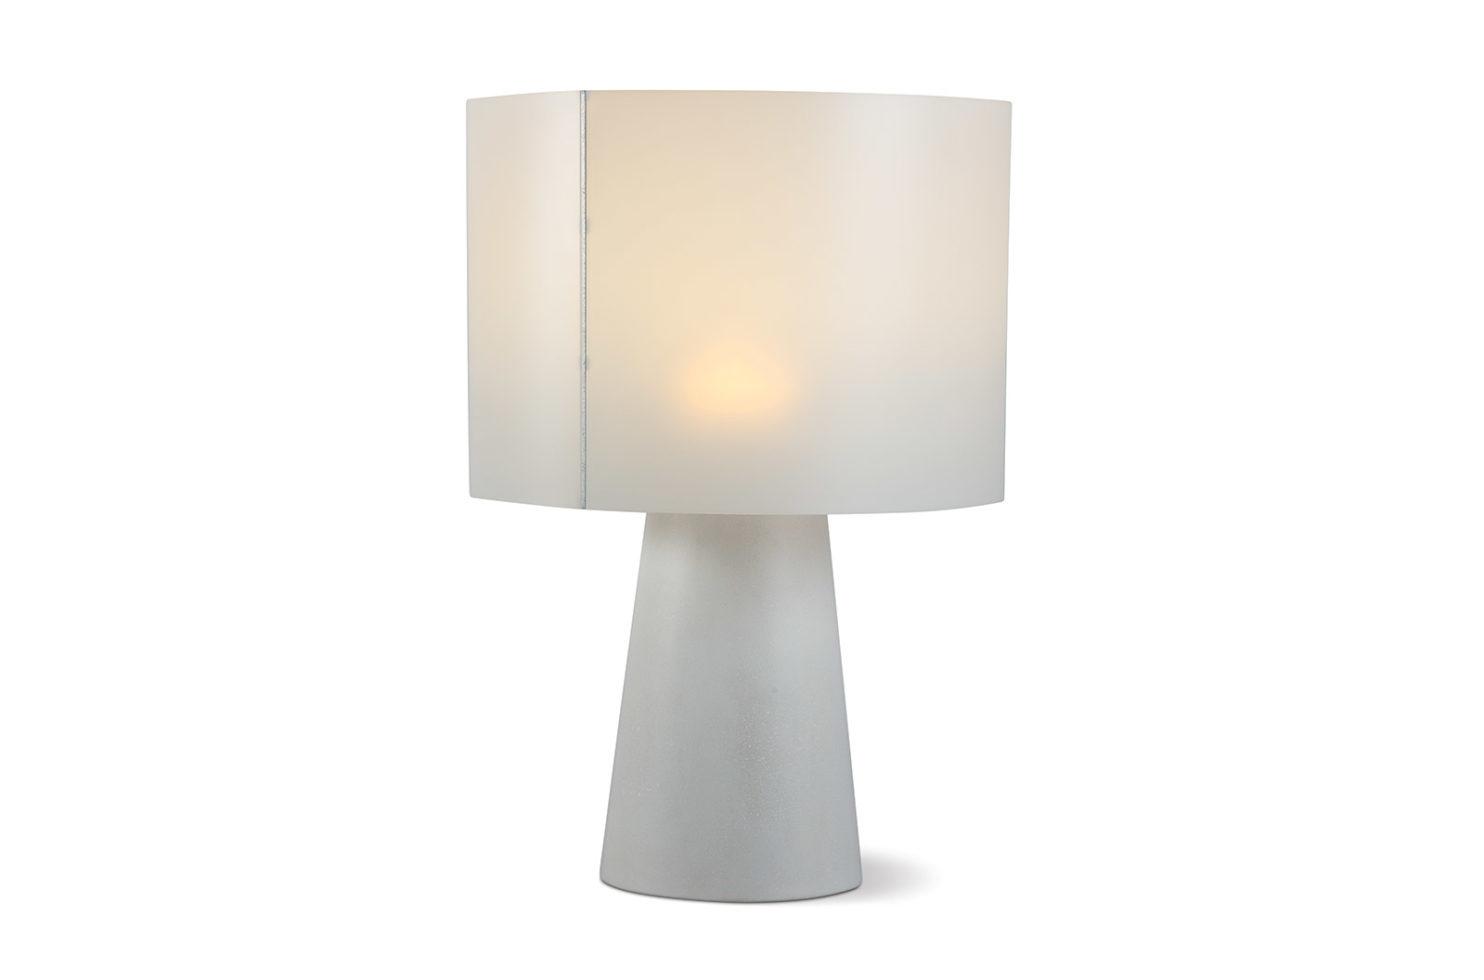 Inda Concrete Table 501LT002P2WP on